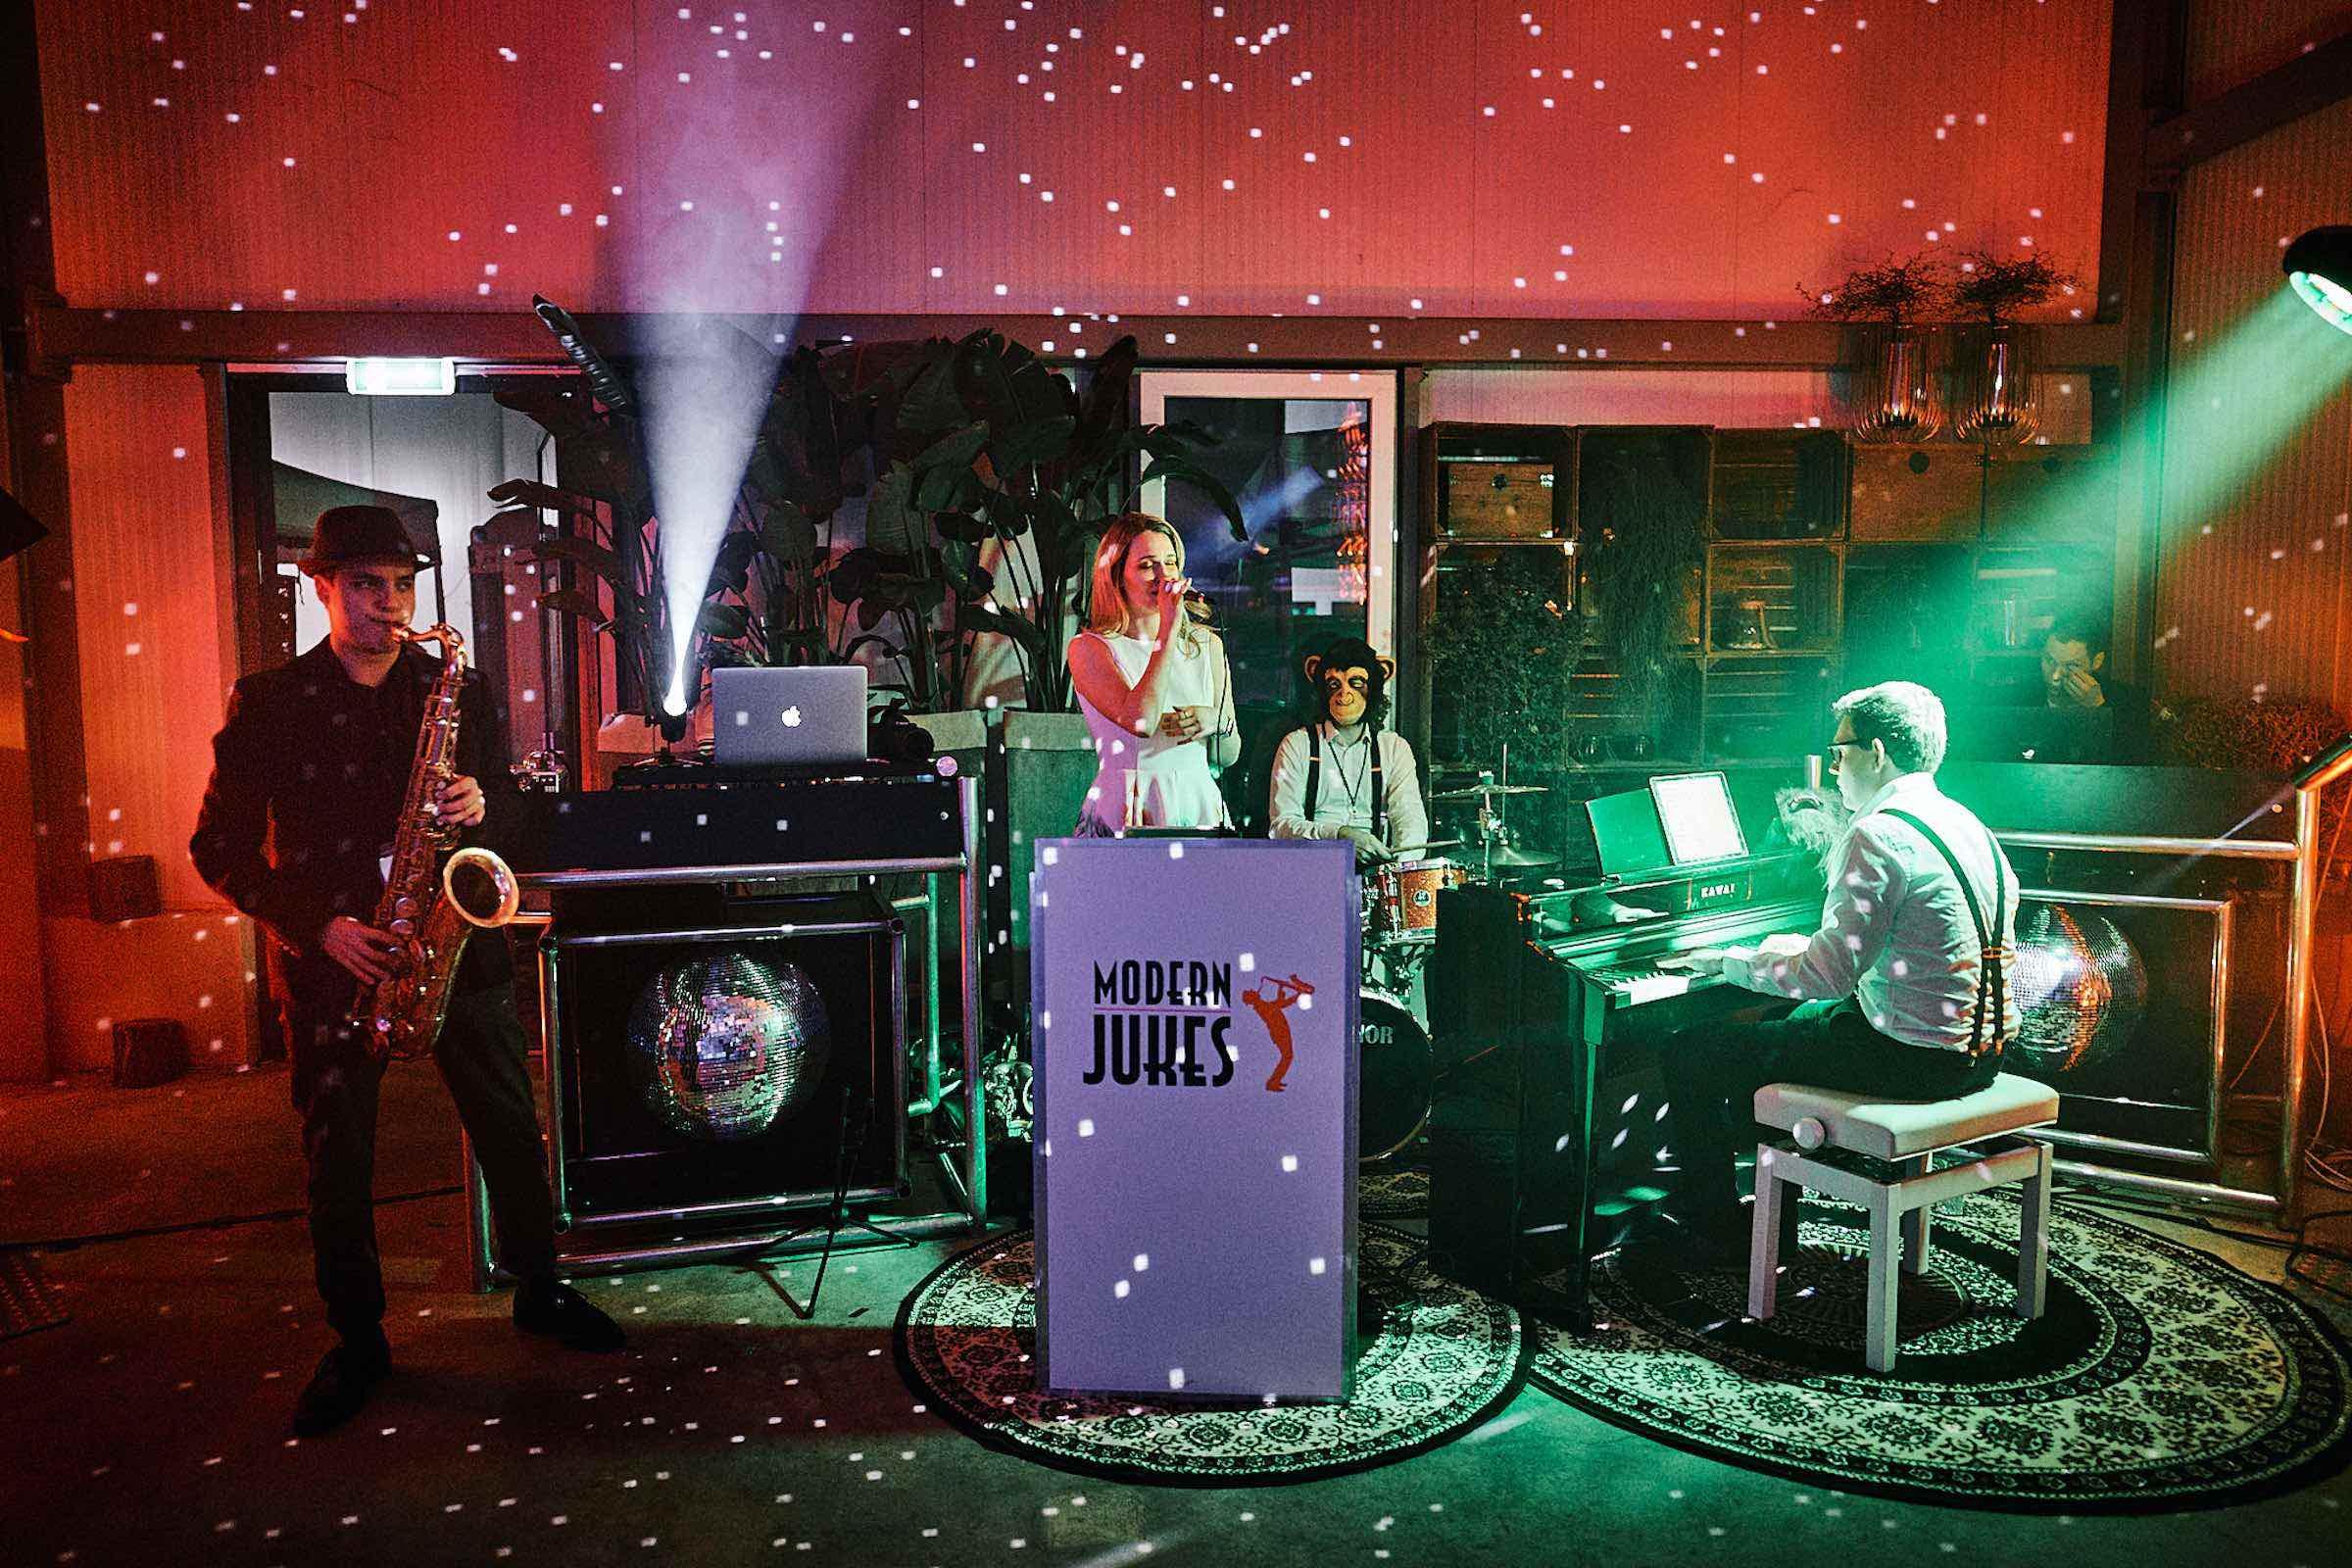 Band | Hannover | Livemusik | Partyband | Loungeband | Empfang | Essen | Dinnerband | Jazzband | Swing | Pop | Lounge | Hochzeitsband | Jazz | Motown | Soul | Hochzeit | Messe | Firmenfeier | Galaband | Lehmann | Eventservice